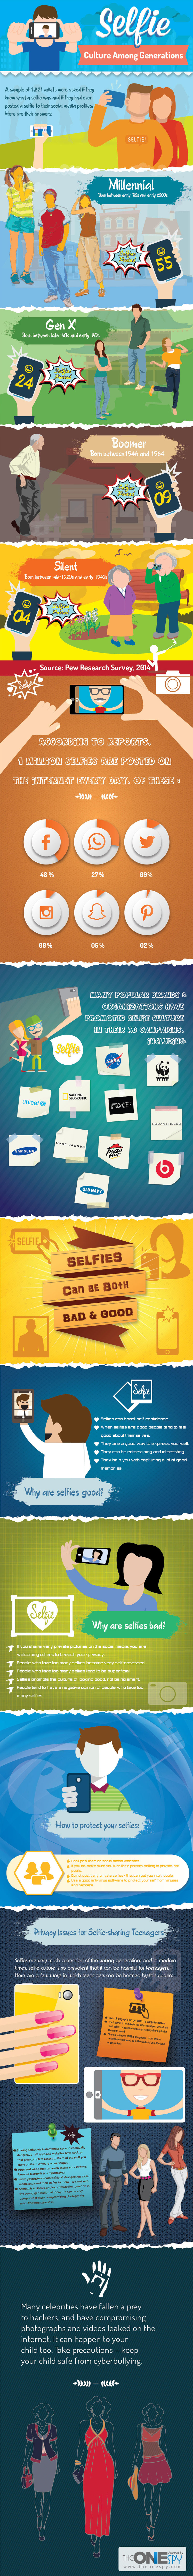 Selfie Culture Among Generation